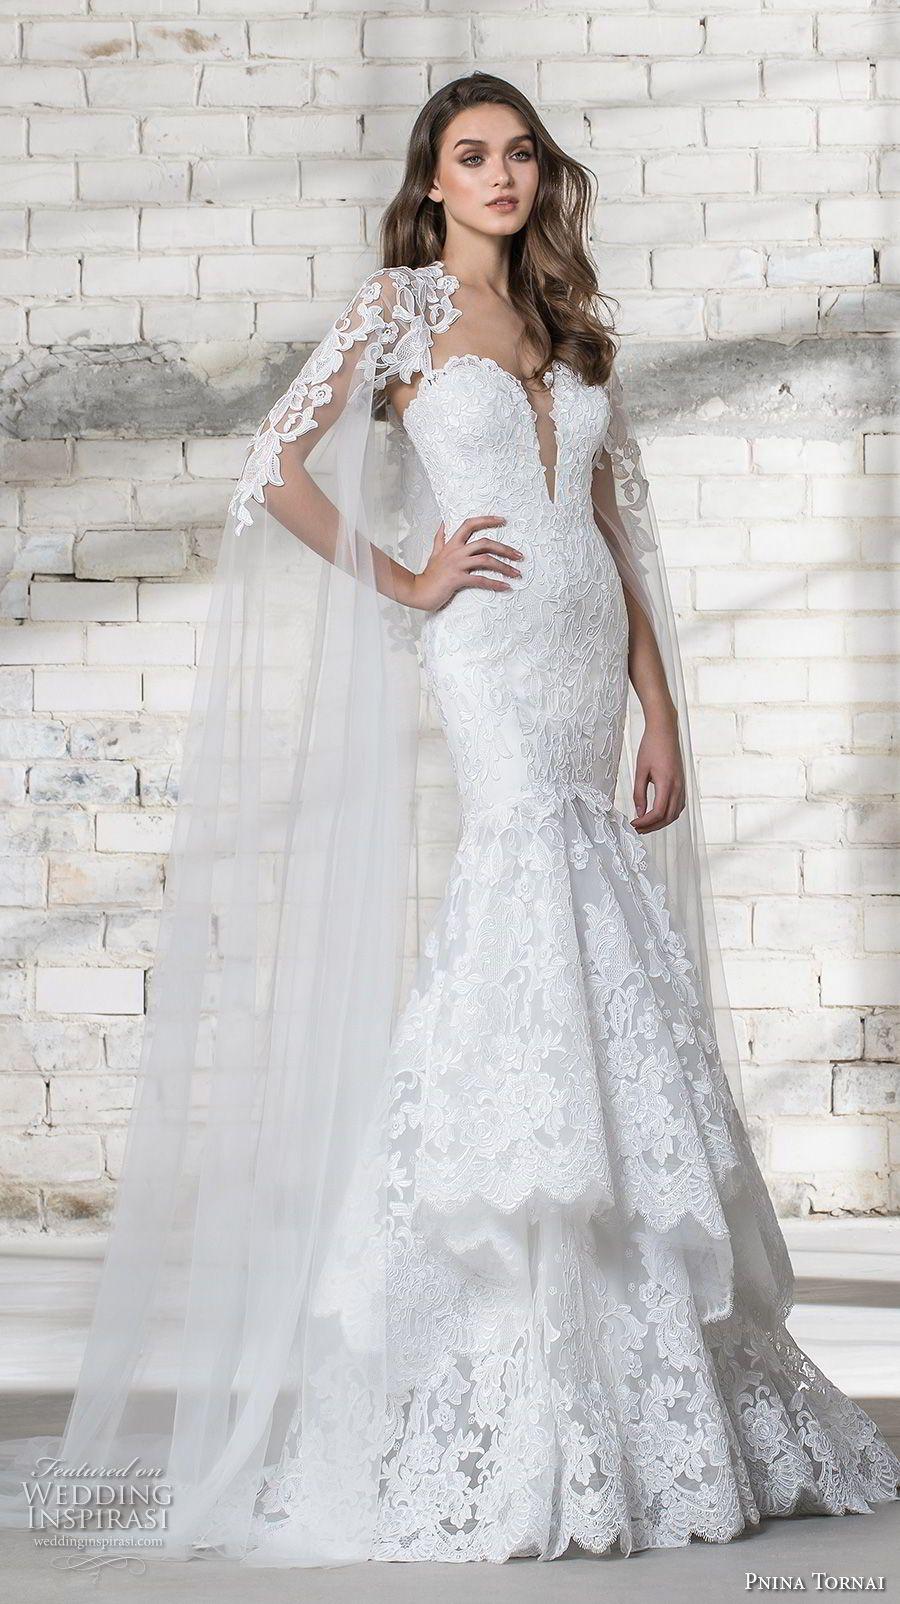 Lace over tulle wedding dress january 2019 Pnina Tornai  Wedding Dresses u ucLoveud Bridal Collection